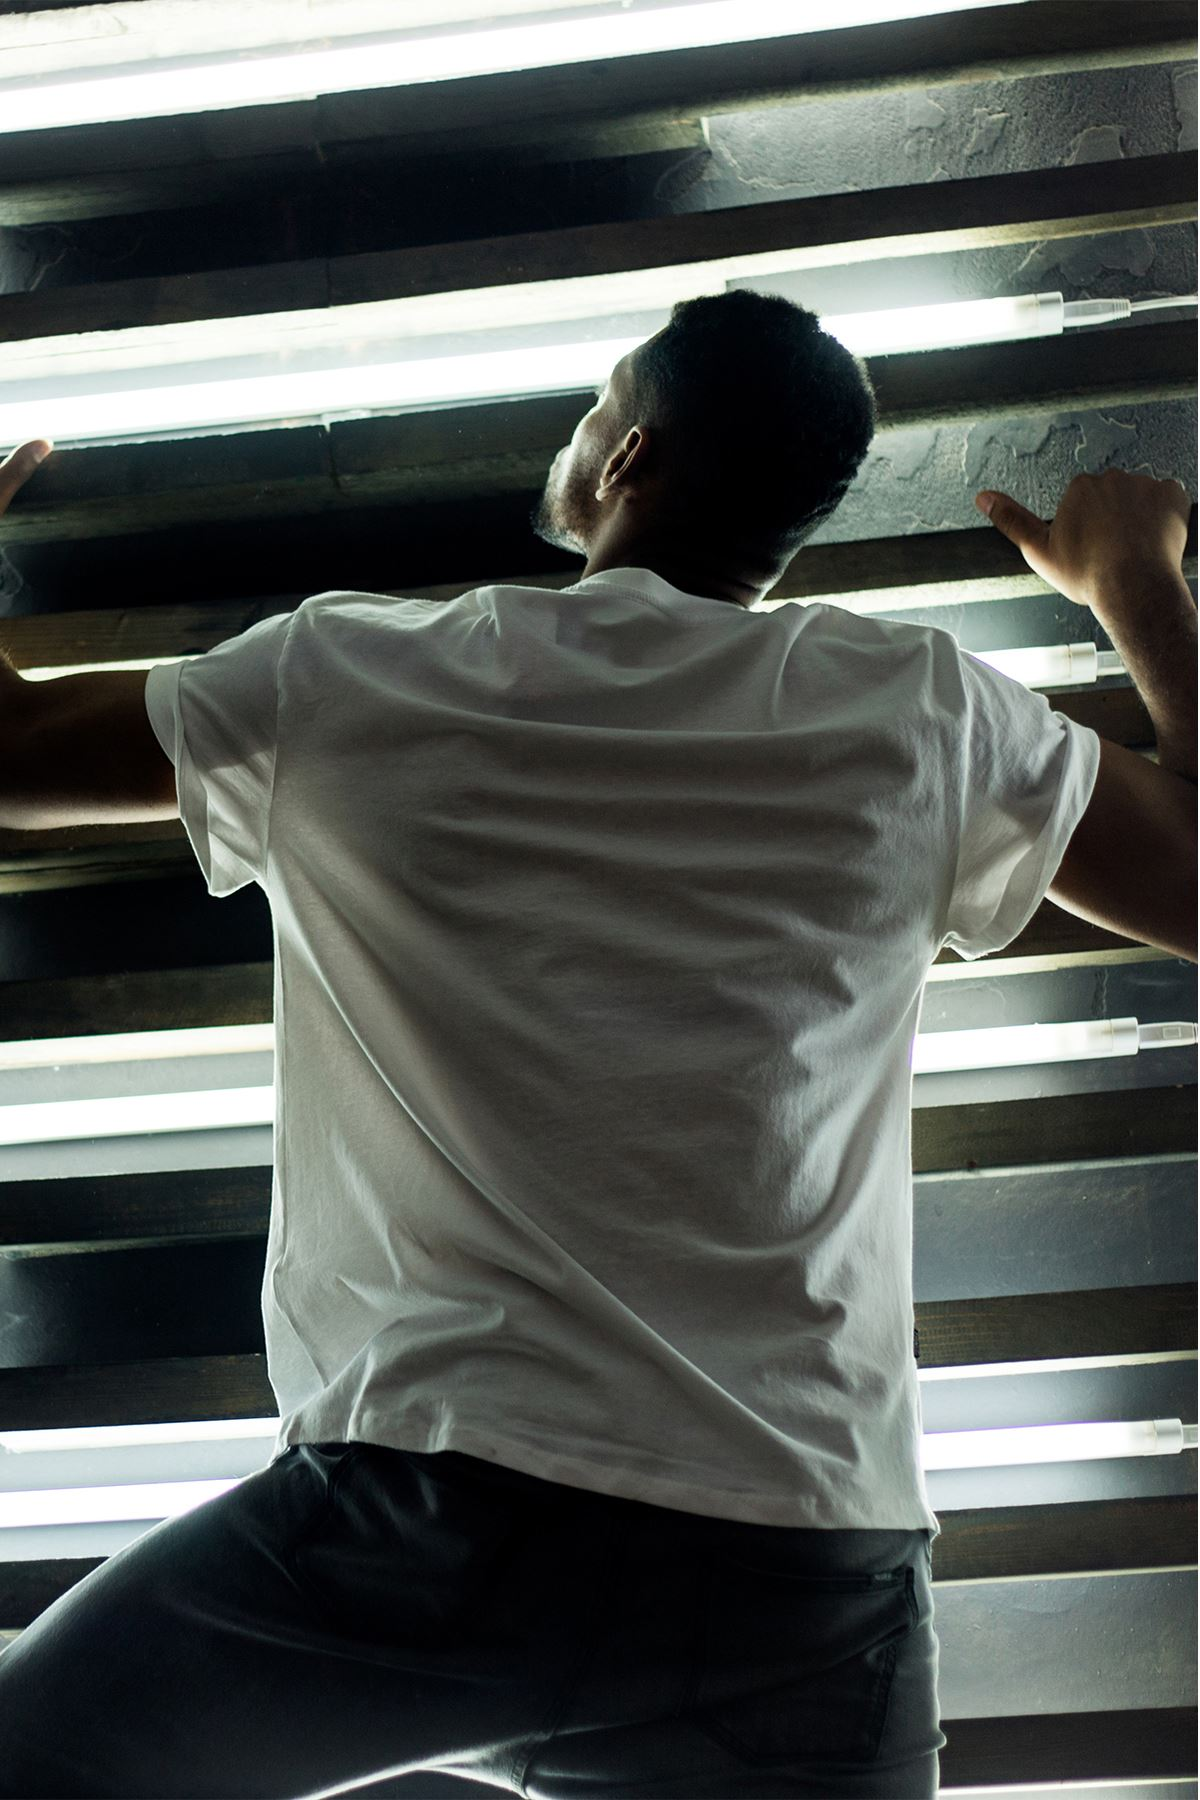 Boston Celtics 31 Beyaz Erkek Oversize Tshirt - Tişört